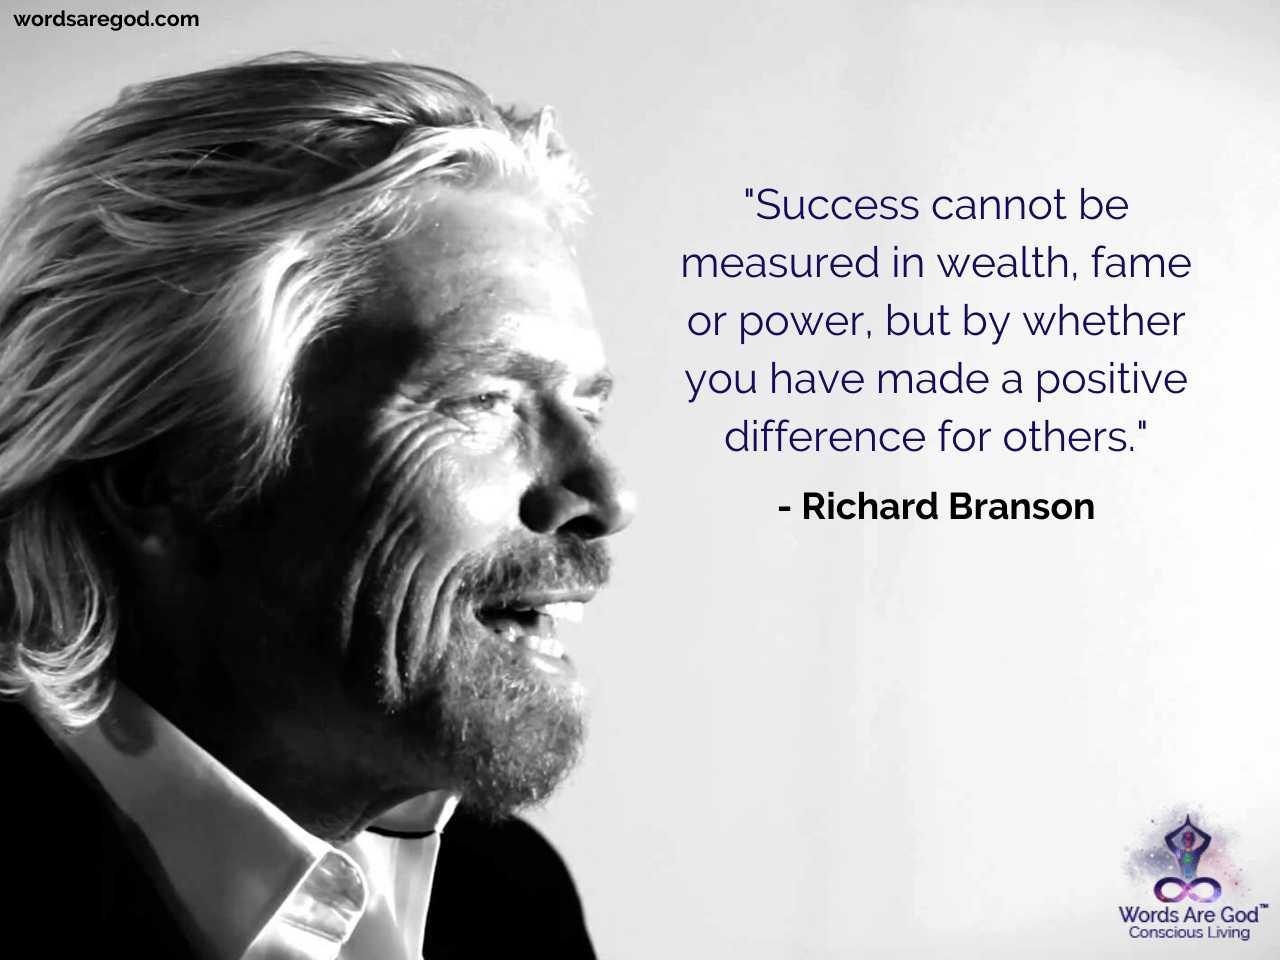 Richard Branson Life Quote